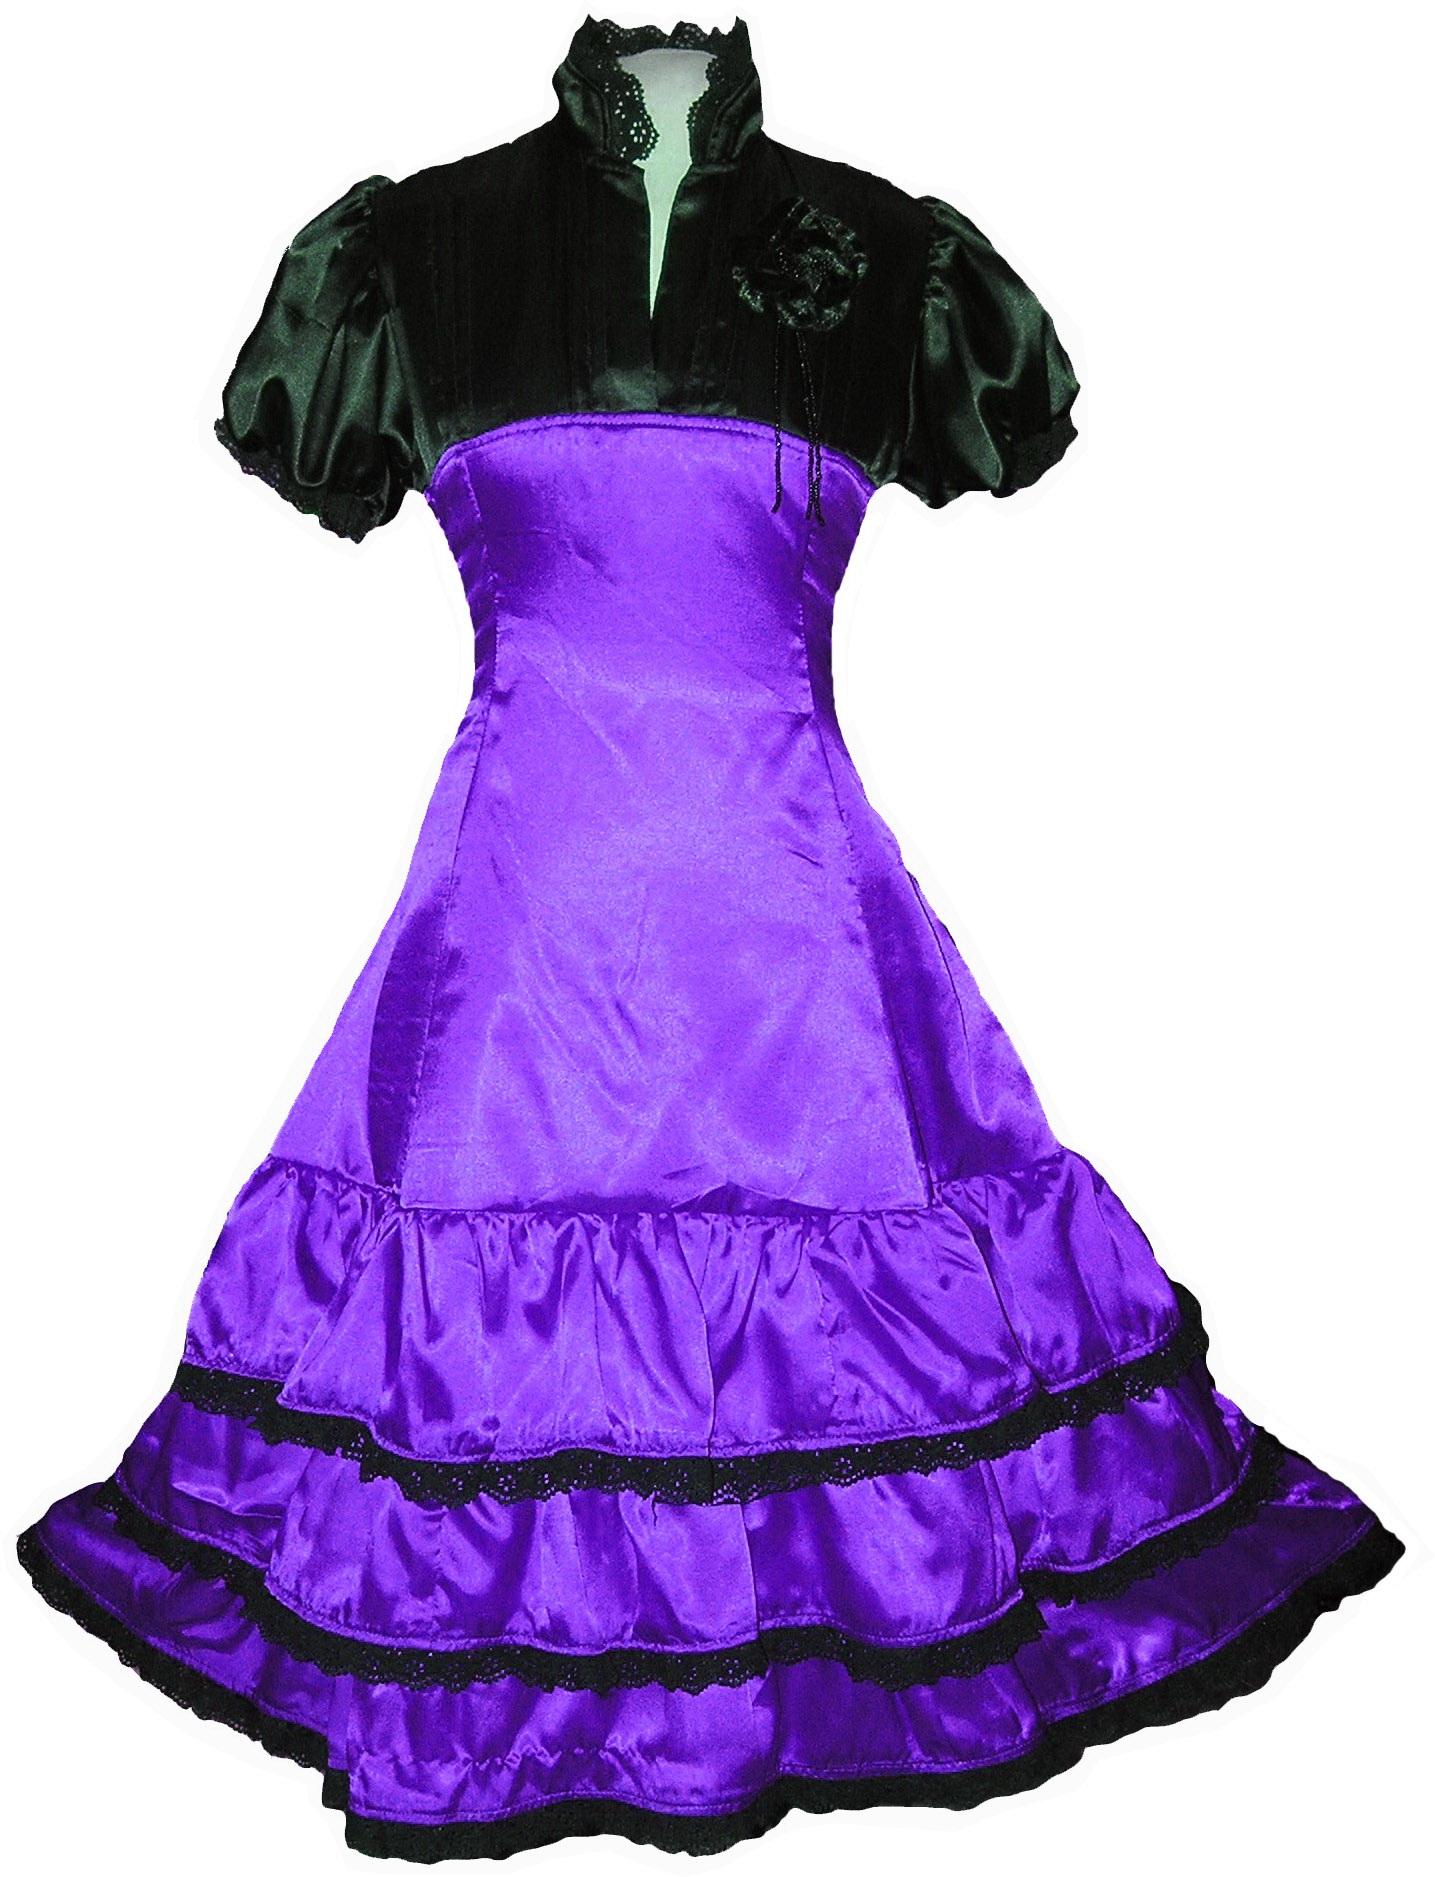 Purple Lolitta Gothic Steampunk Queen Dress Party 60s 70s